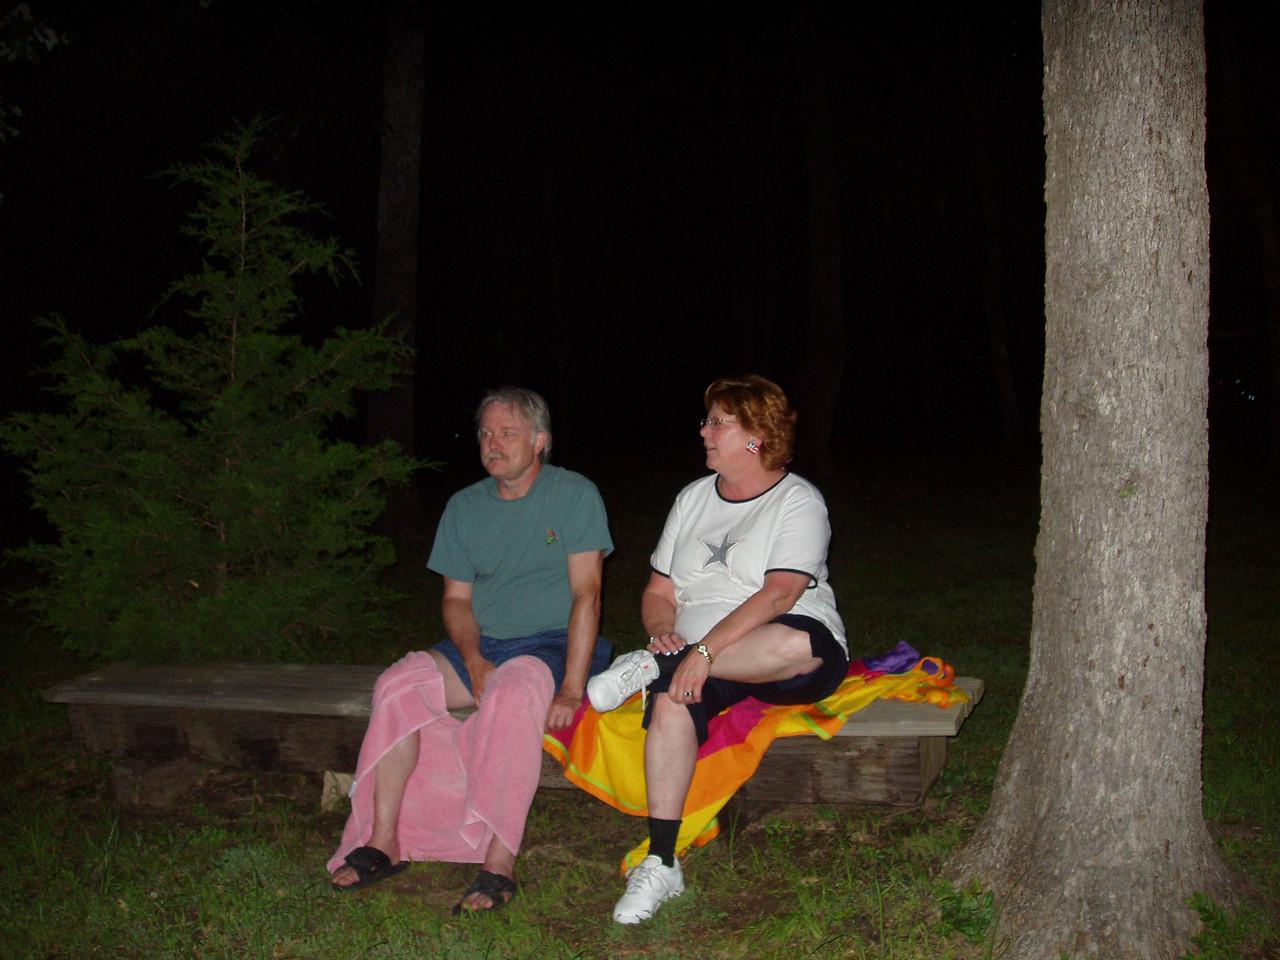 David and Cindy Davis watch the fireworks